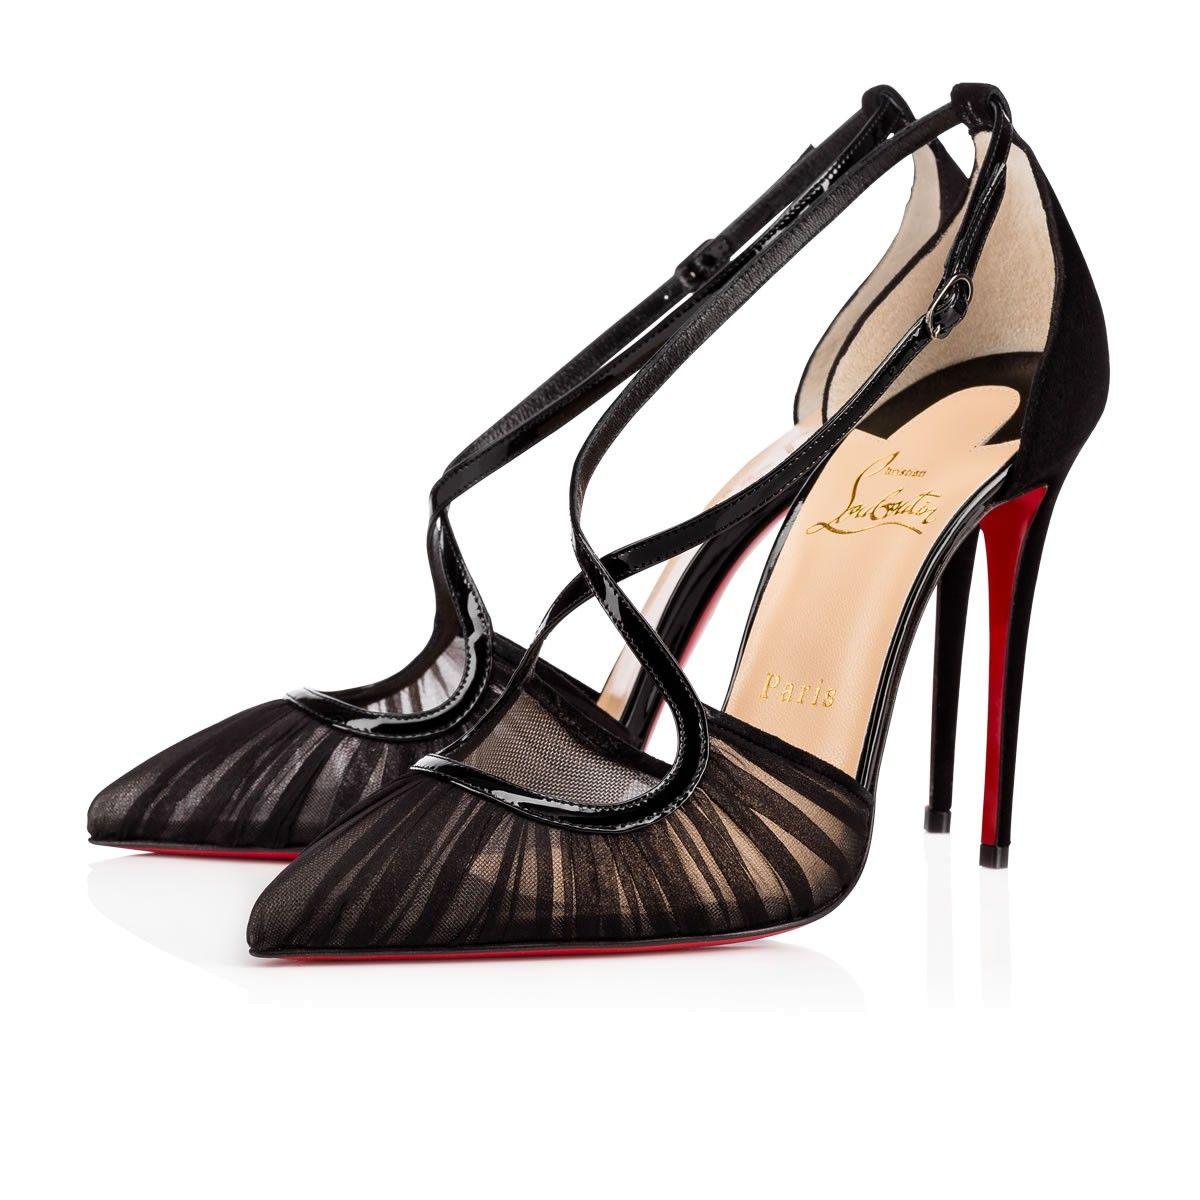 Shoes - Marchella - Christian Louboutin